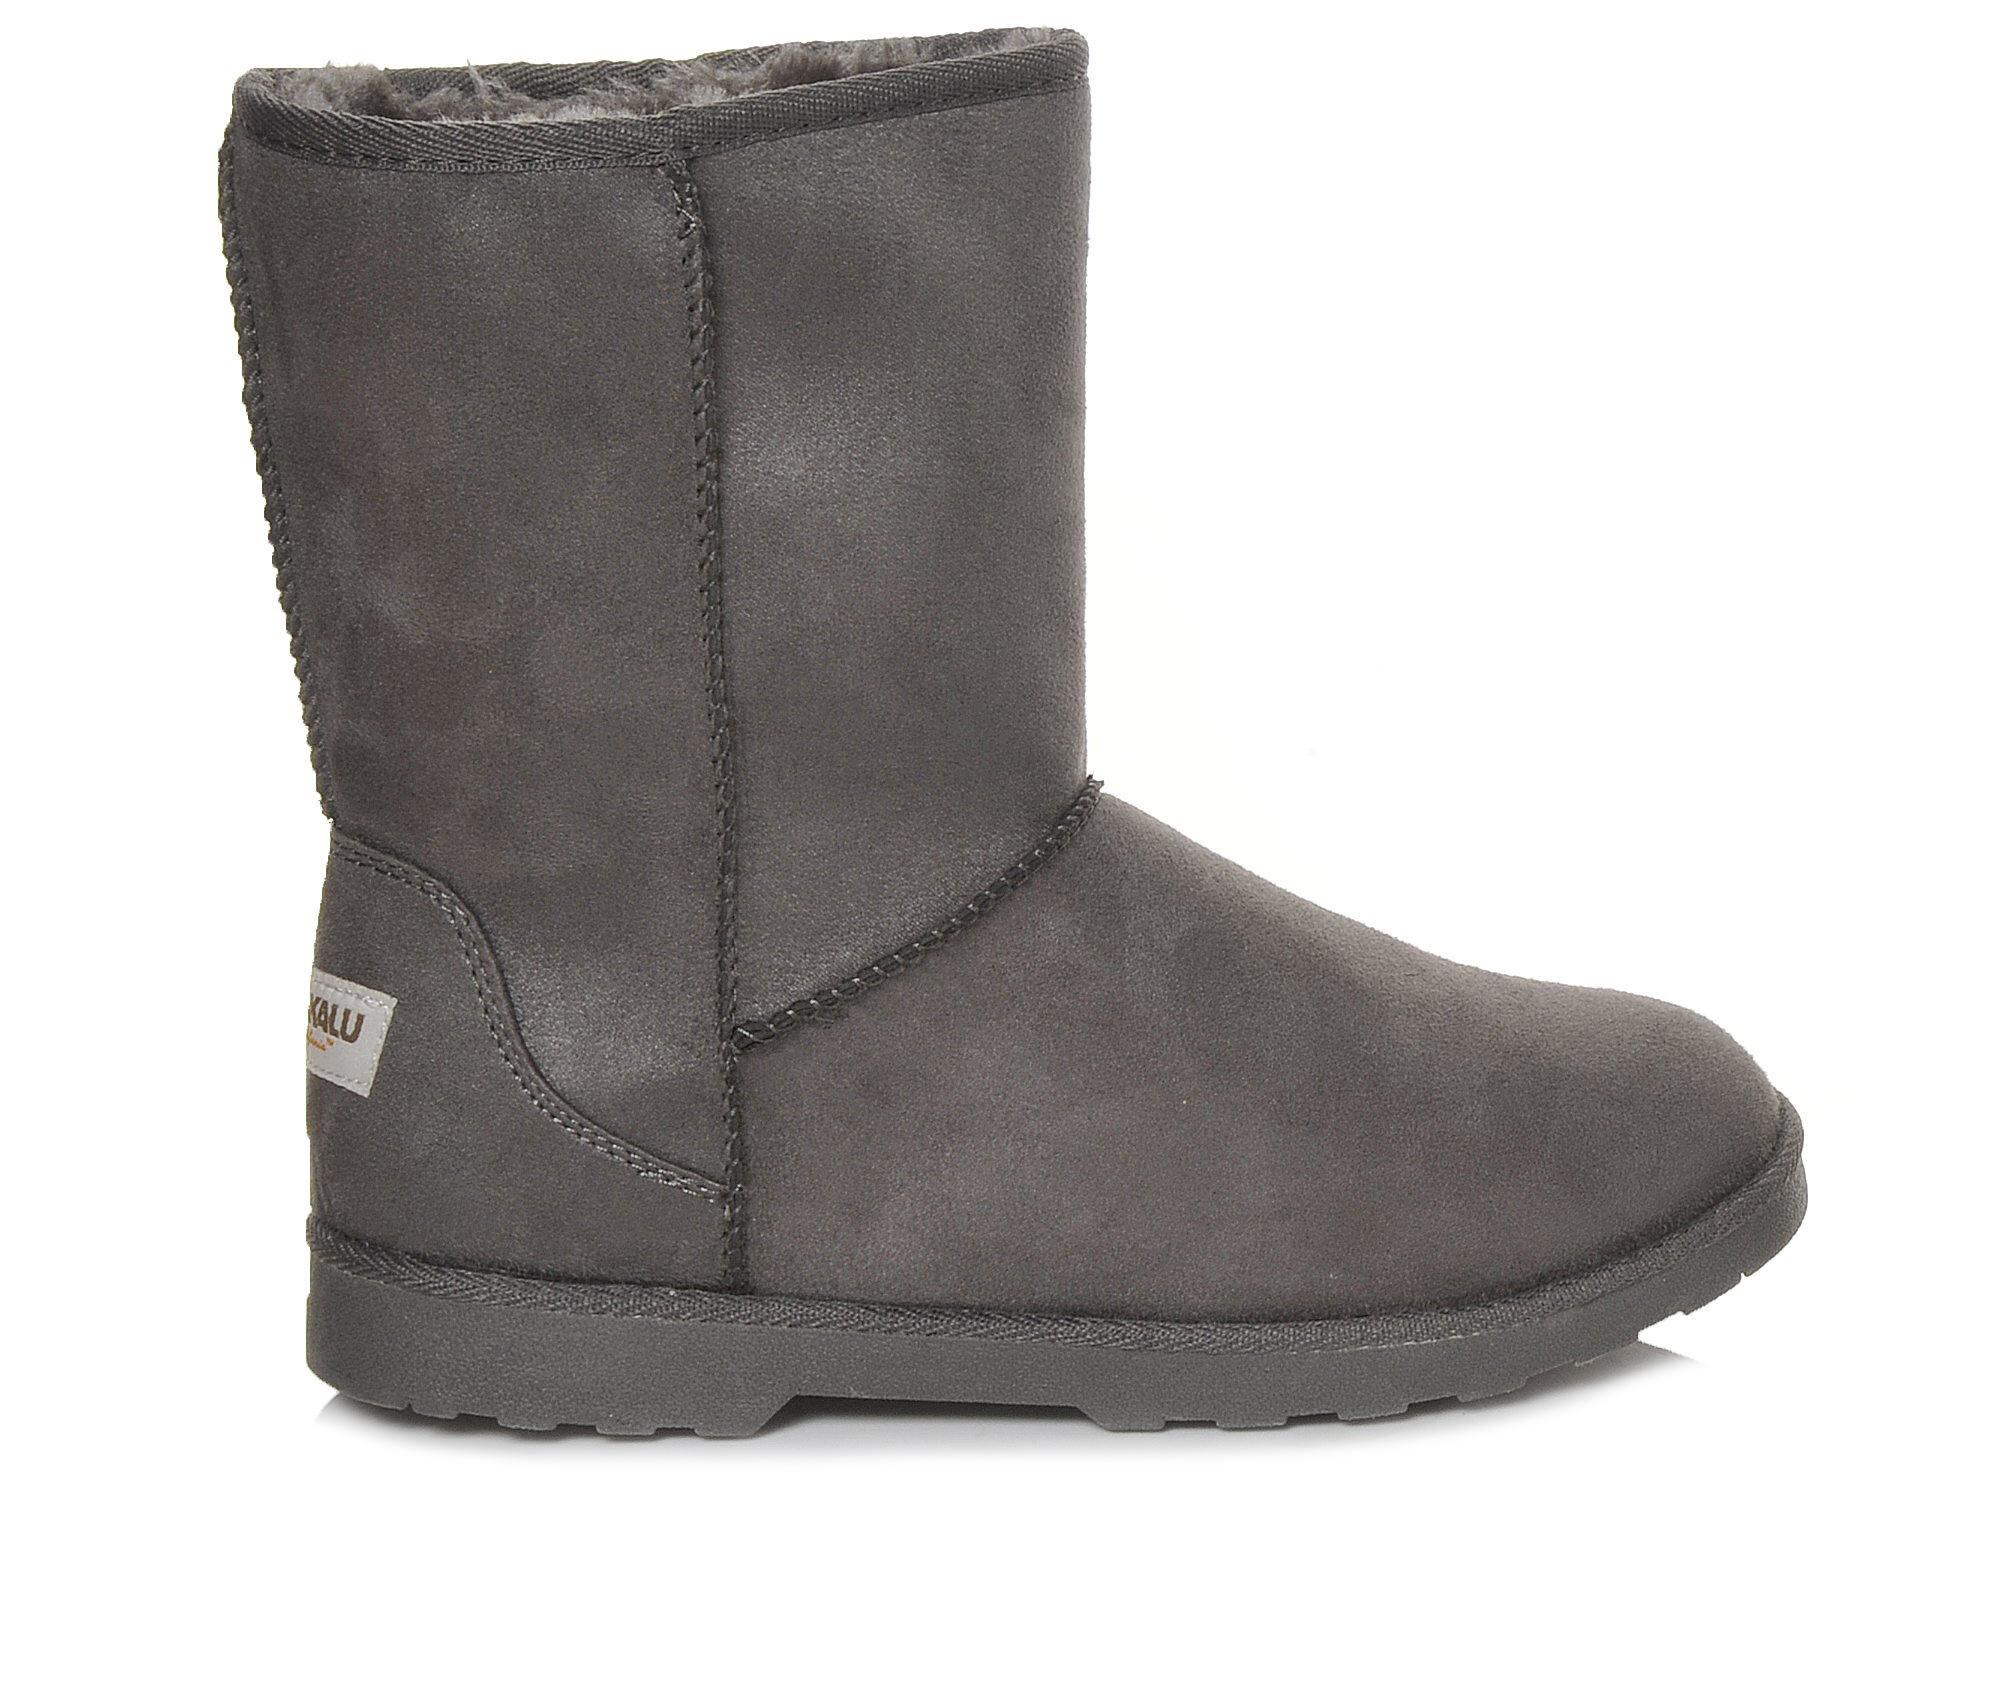 purchase discount Women's Makalu Ani Boots Grey